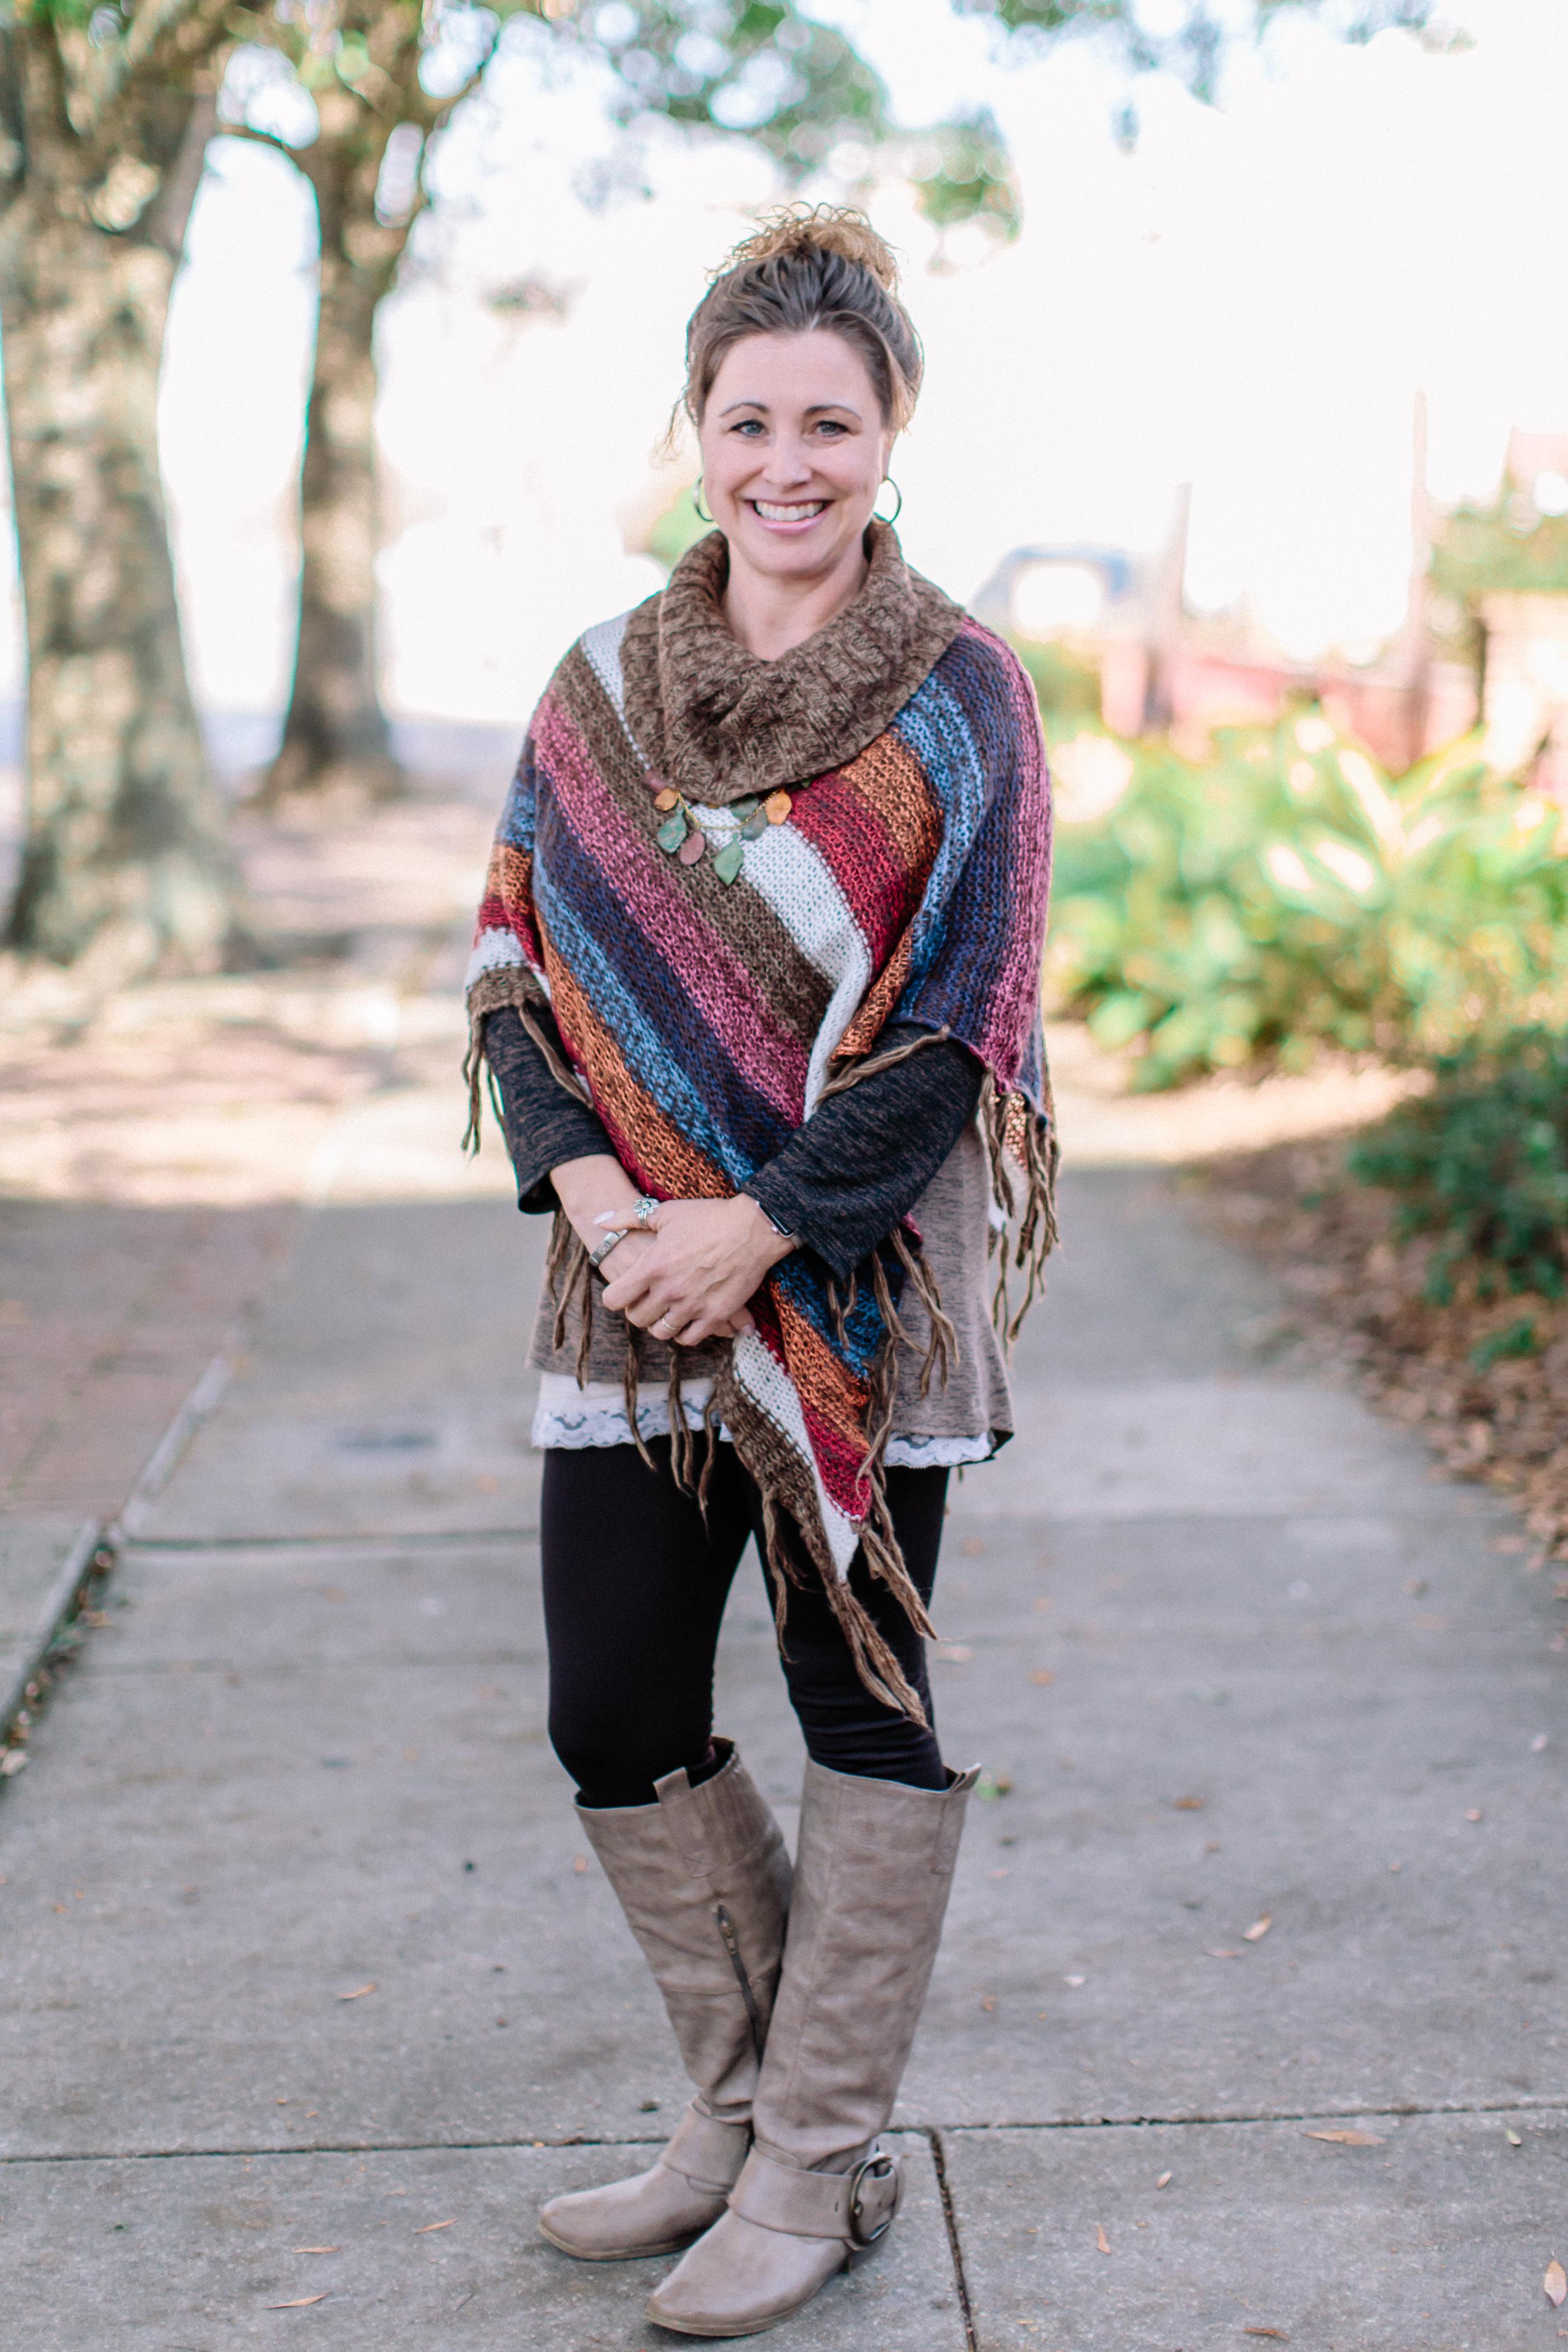 Angela Stebbins